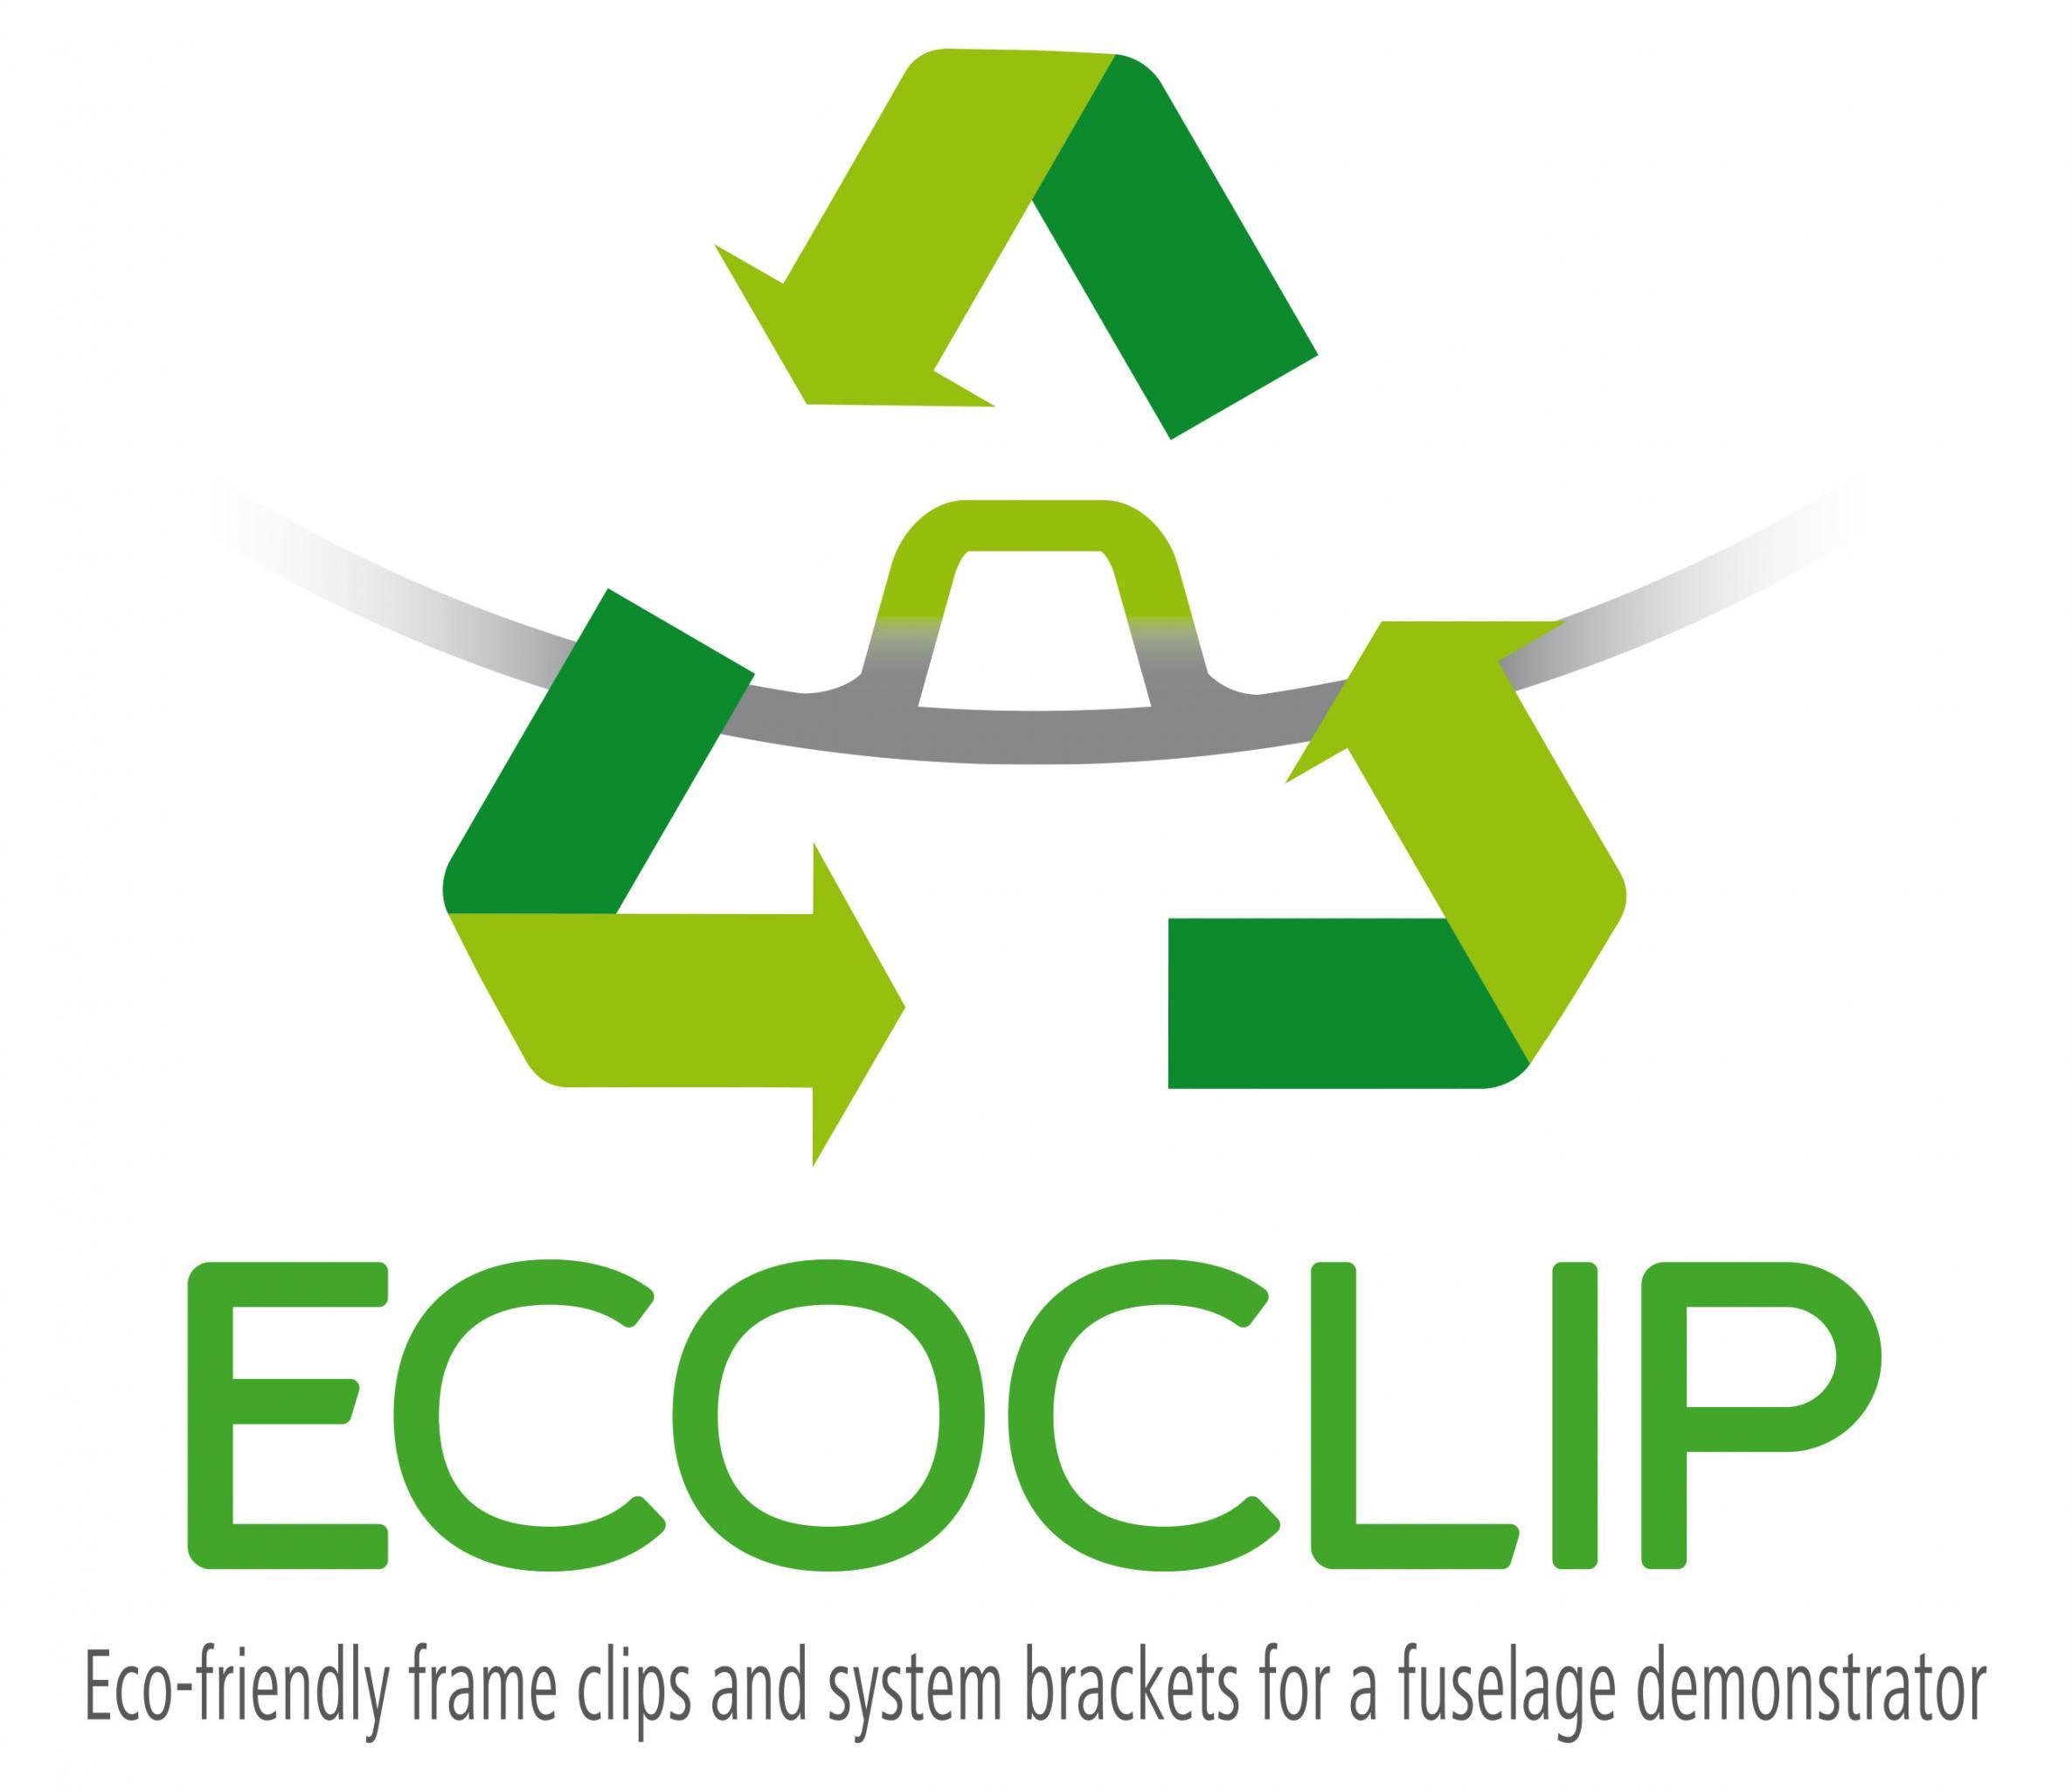 EcoclipLog1.jpg